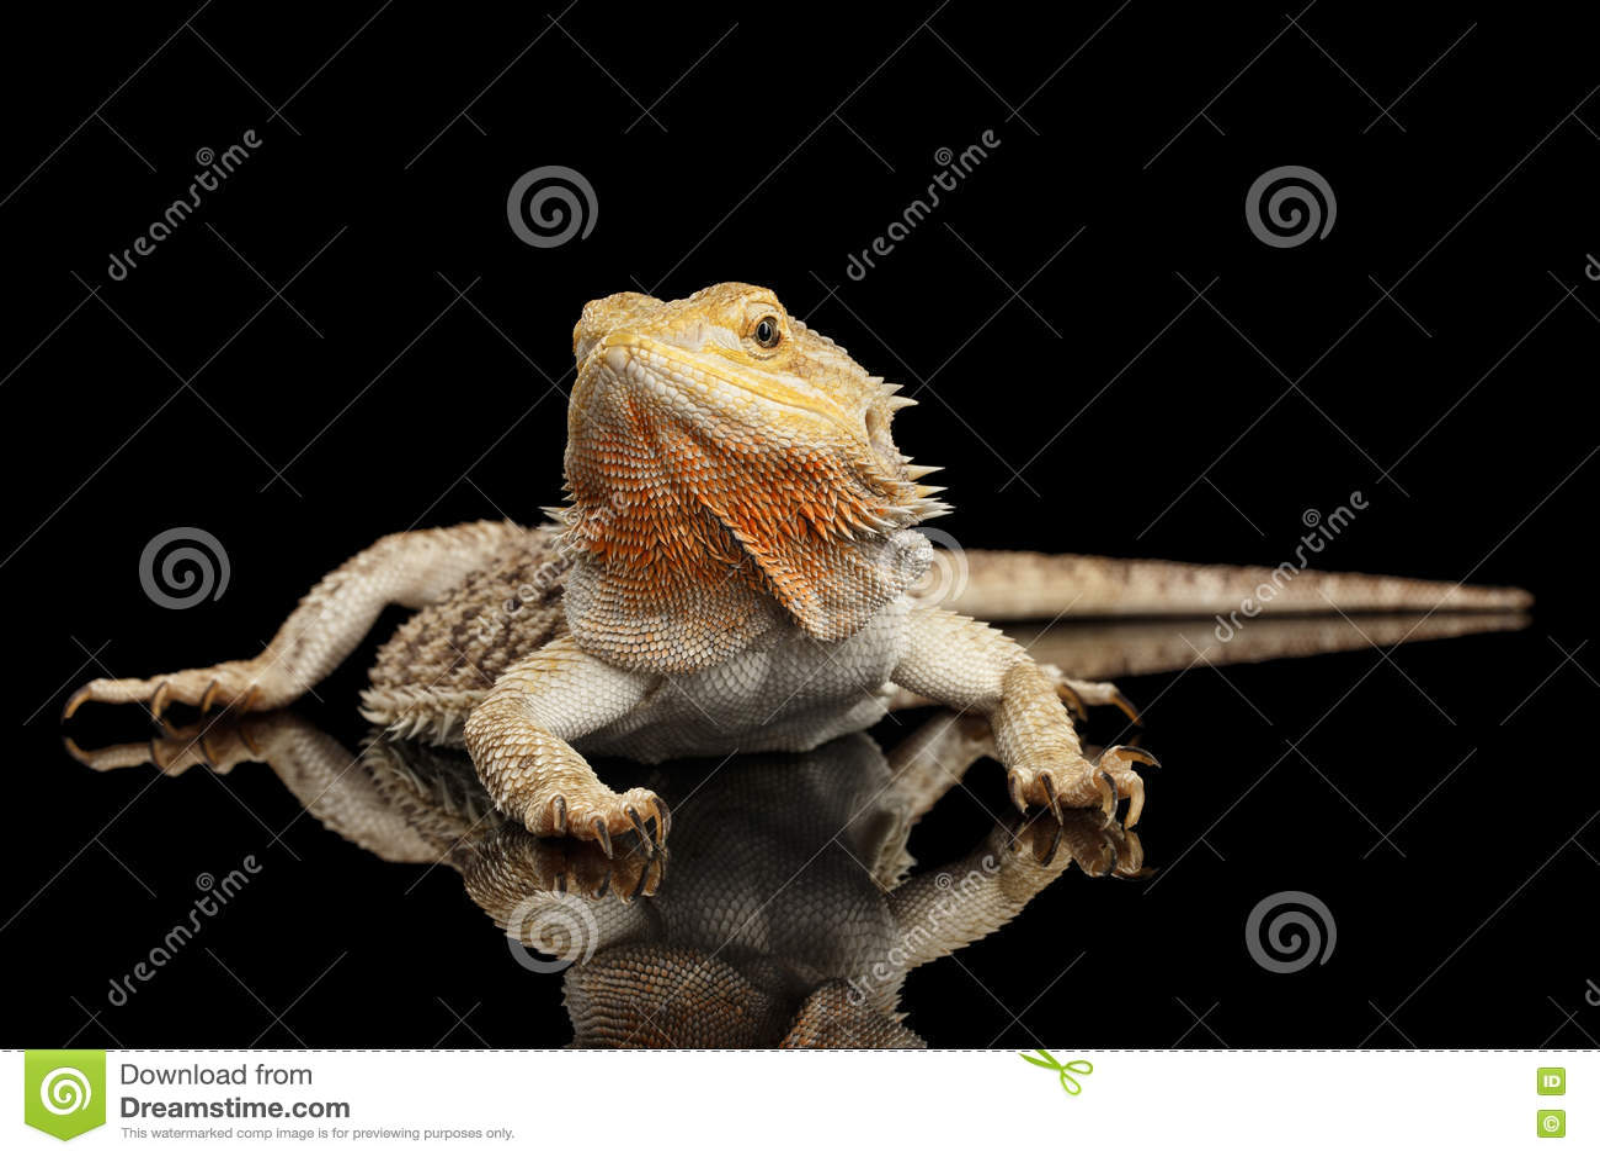 Dragon Llizard Lying farpado no espelho, fundo preto isolado